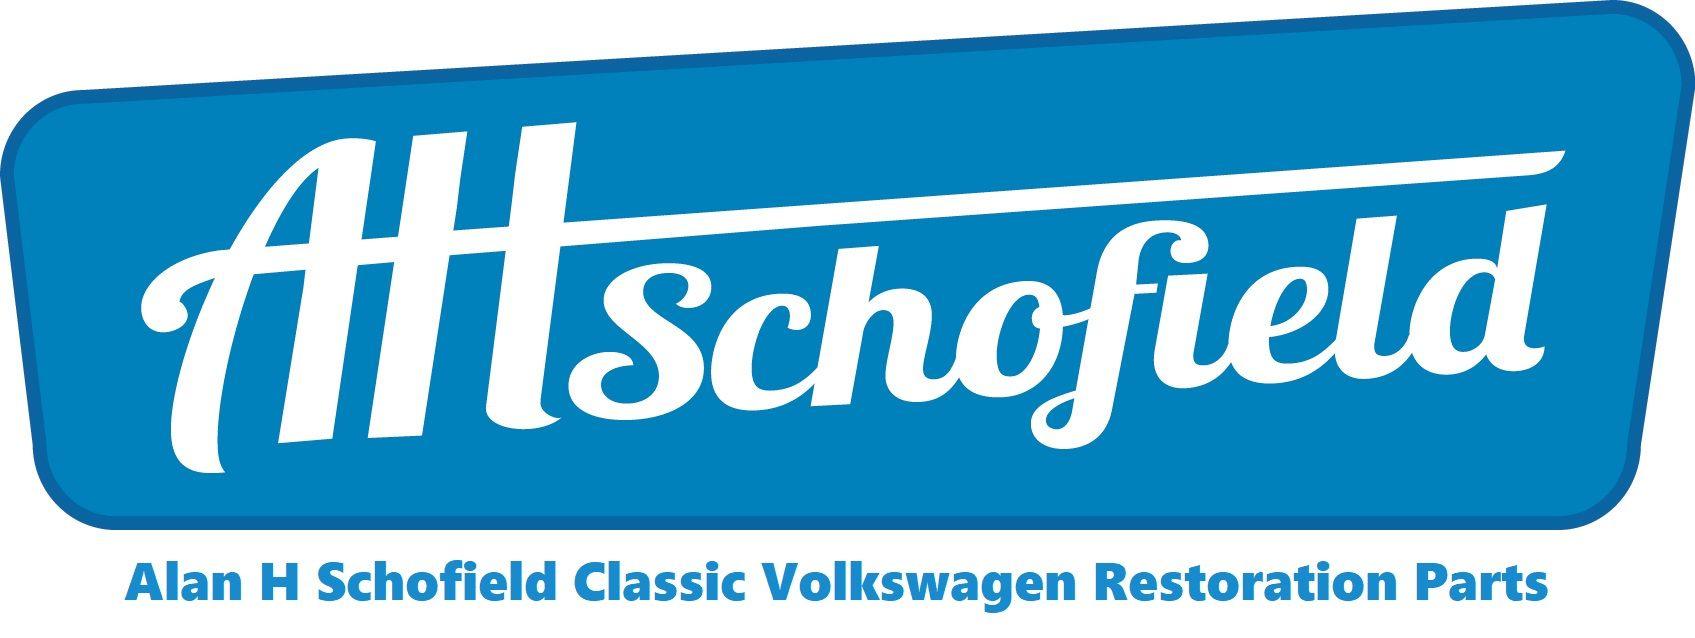 Alan H Schofield Classic Volkswagen Restoration Parts